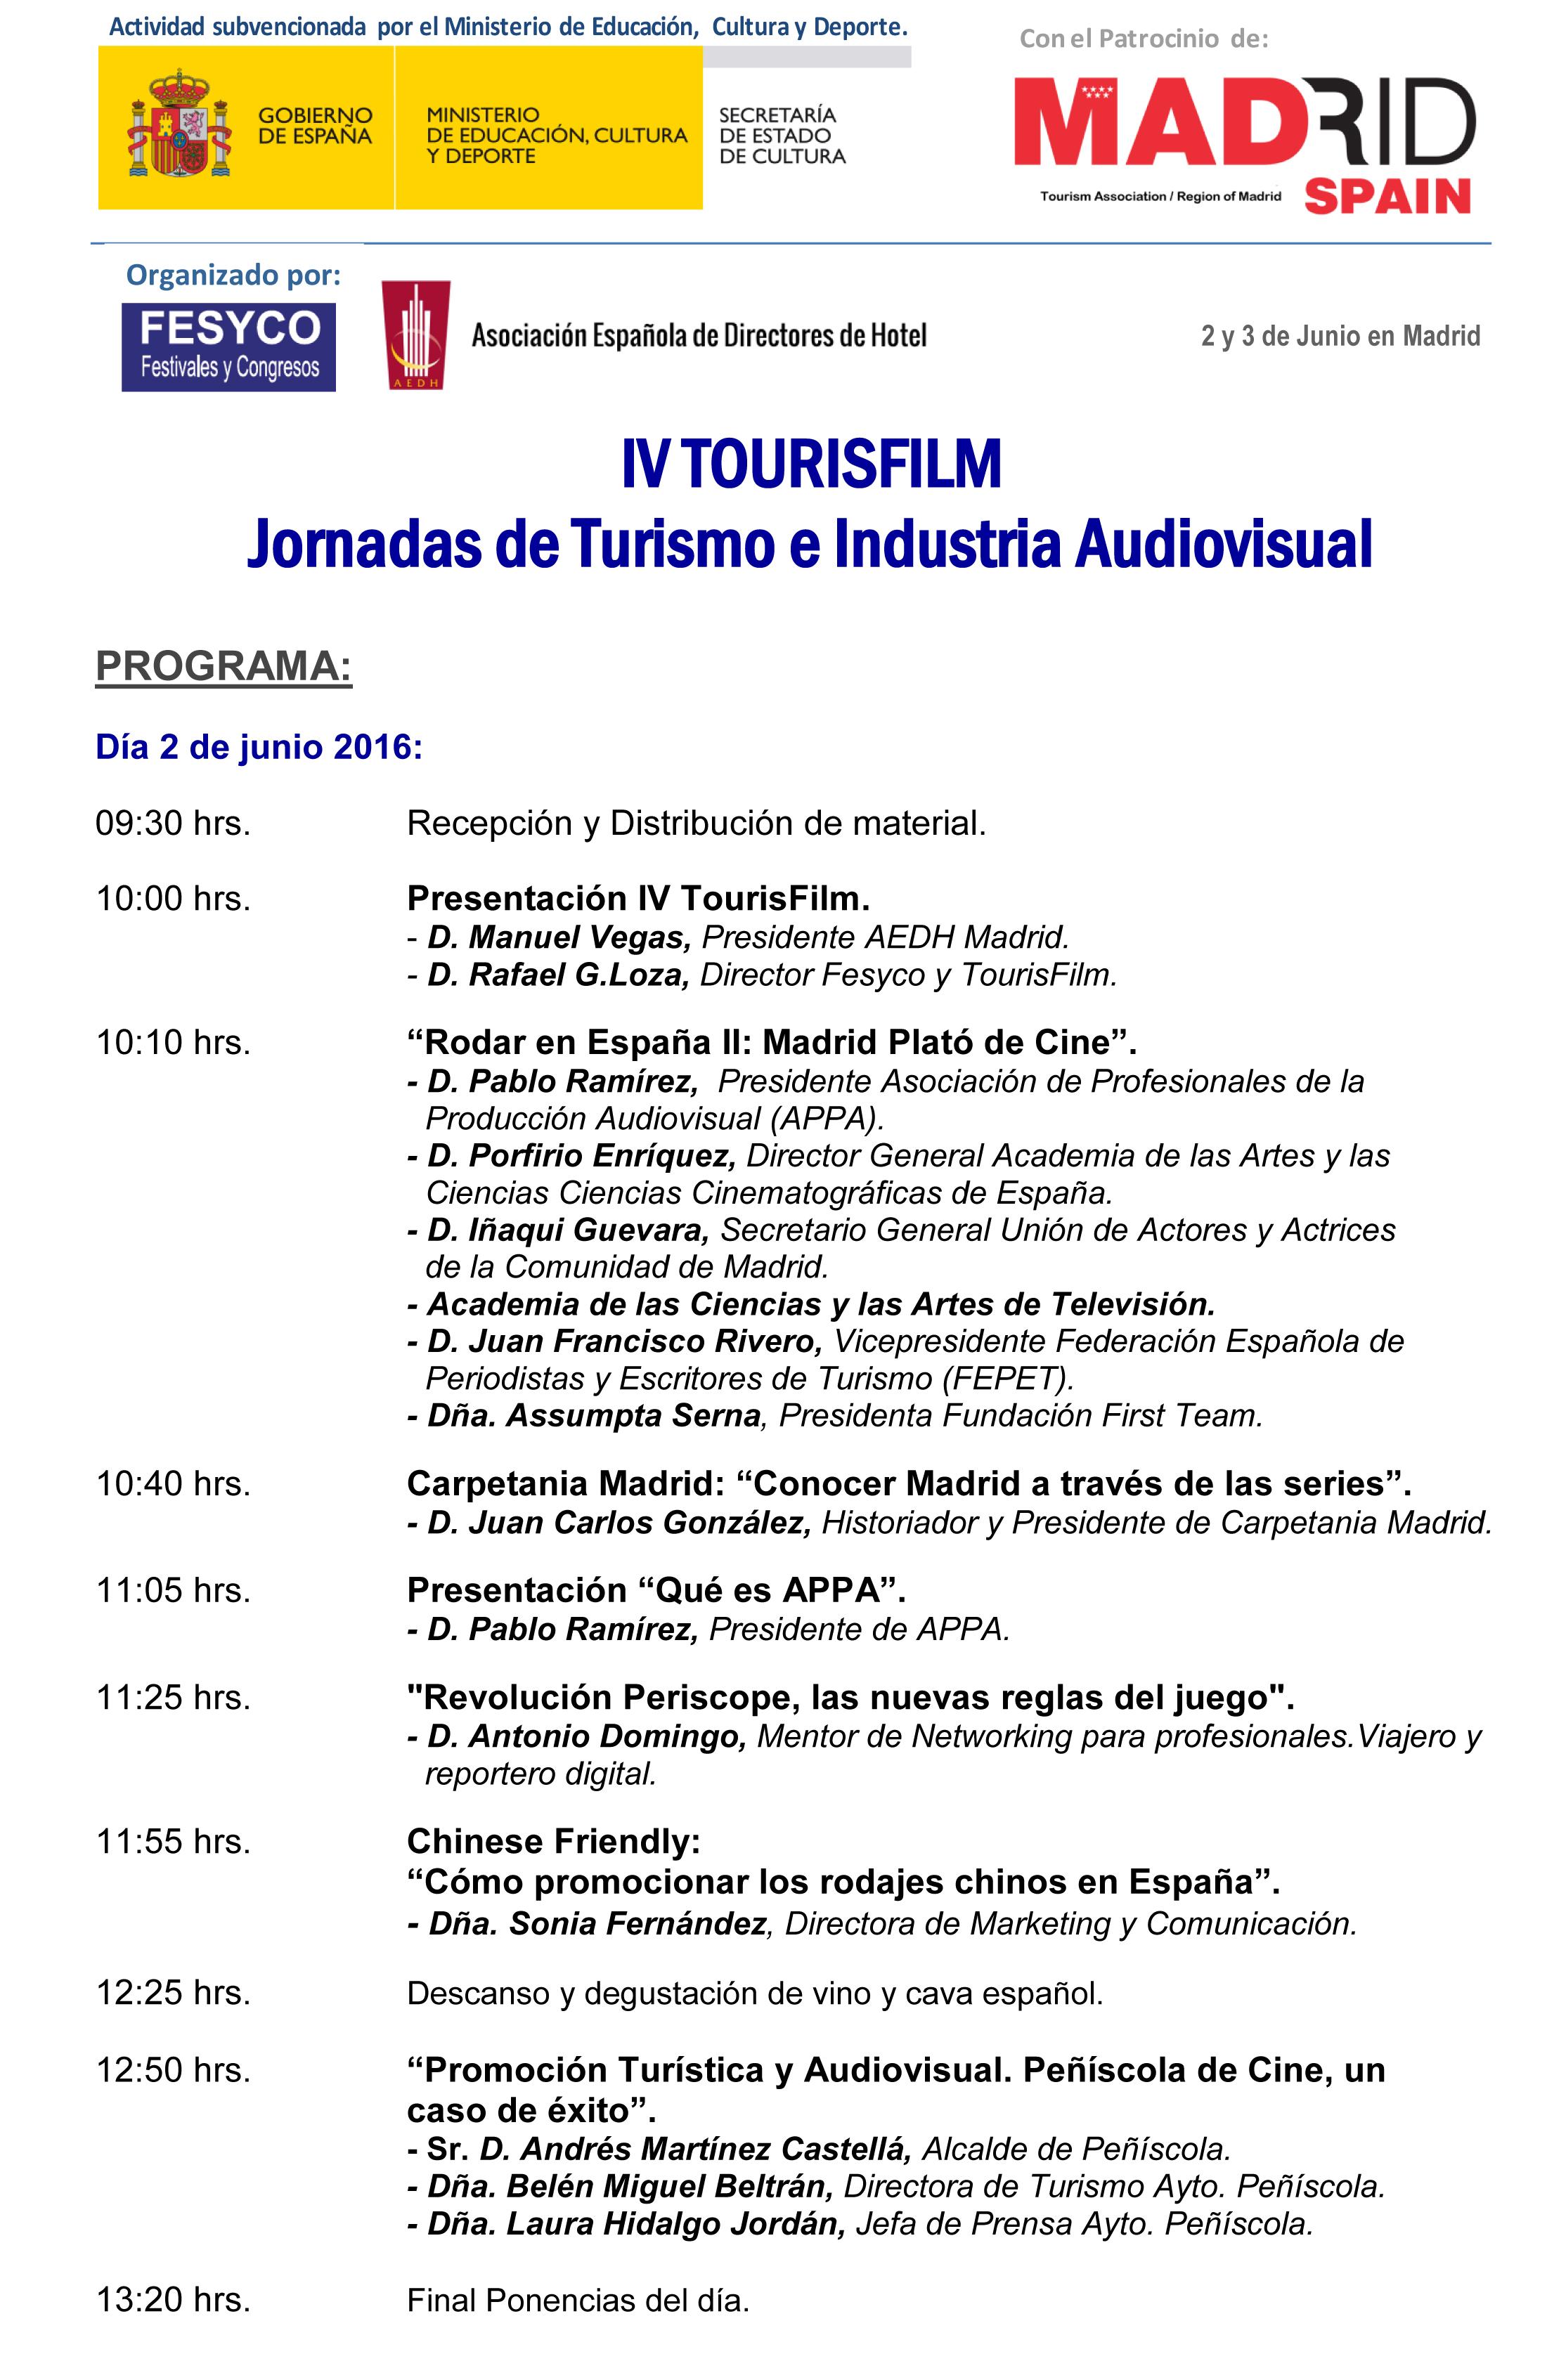 Programa IV TOURISFILM-1